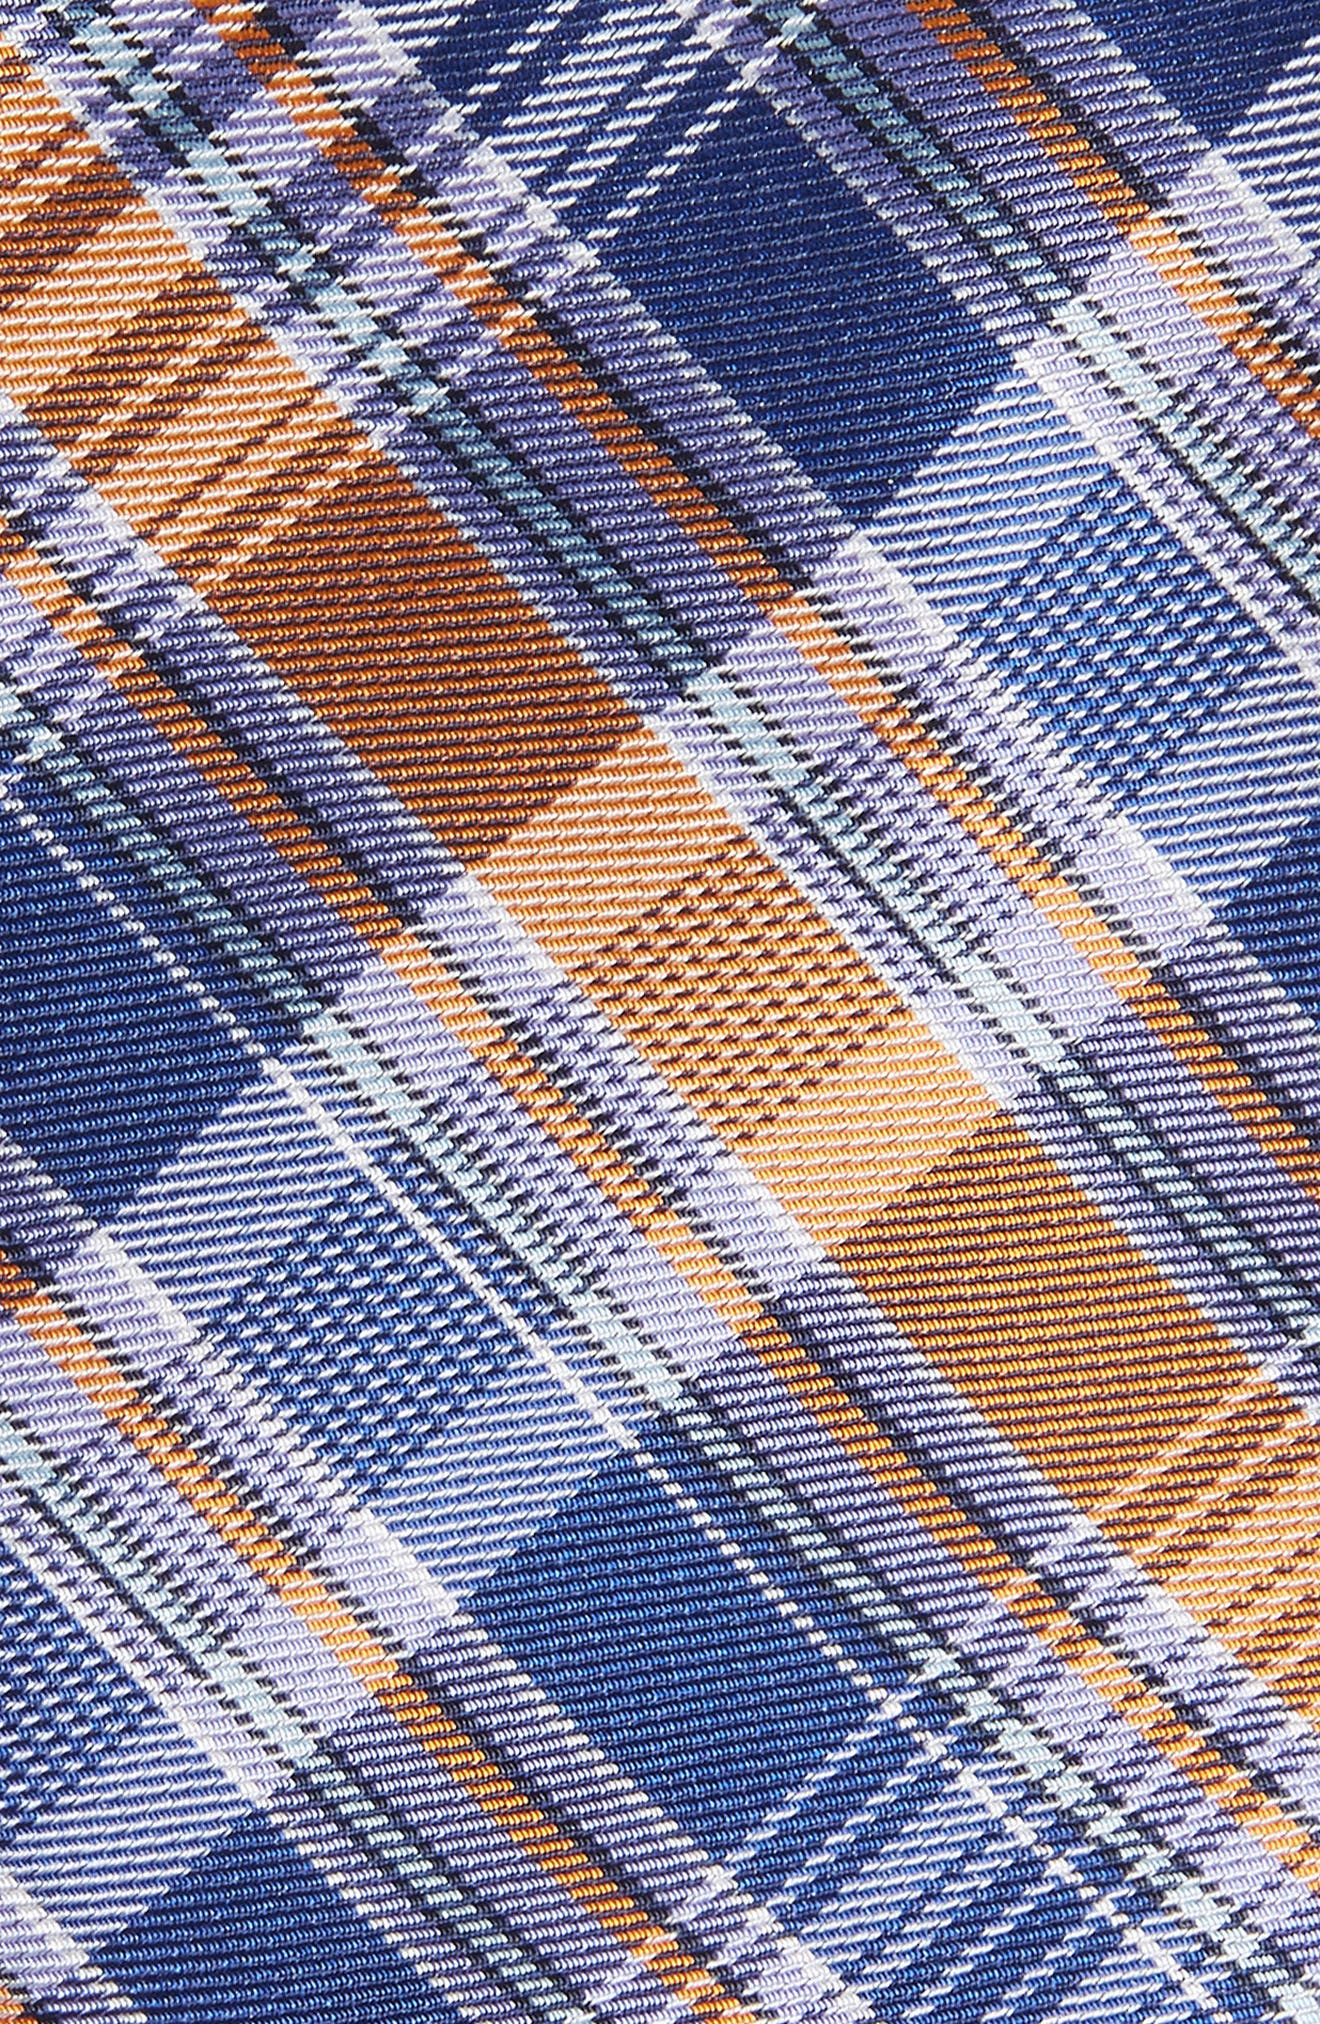 Sassafrass Plaid Silk Tie,                             Alternate thumbnail 2, color,                             Bright Fashion Blue